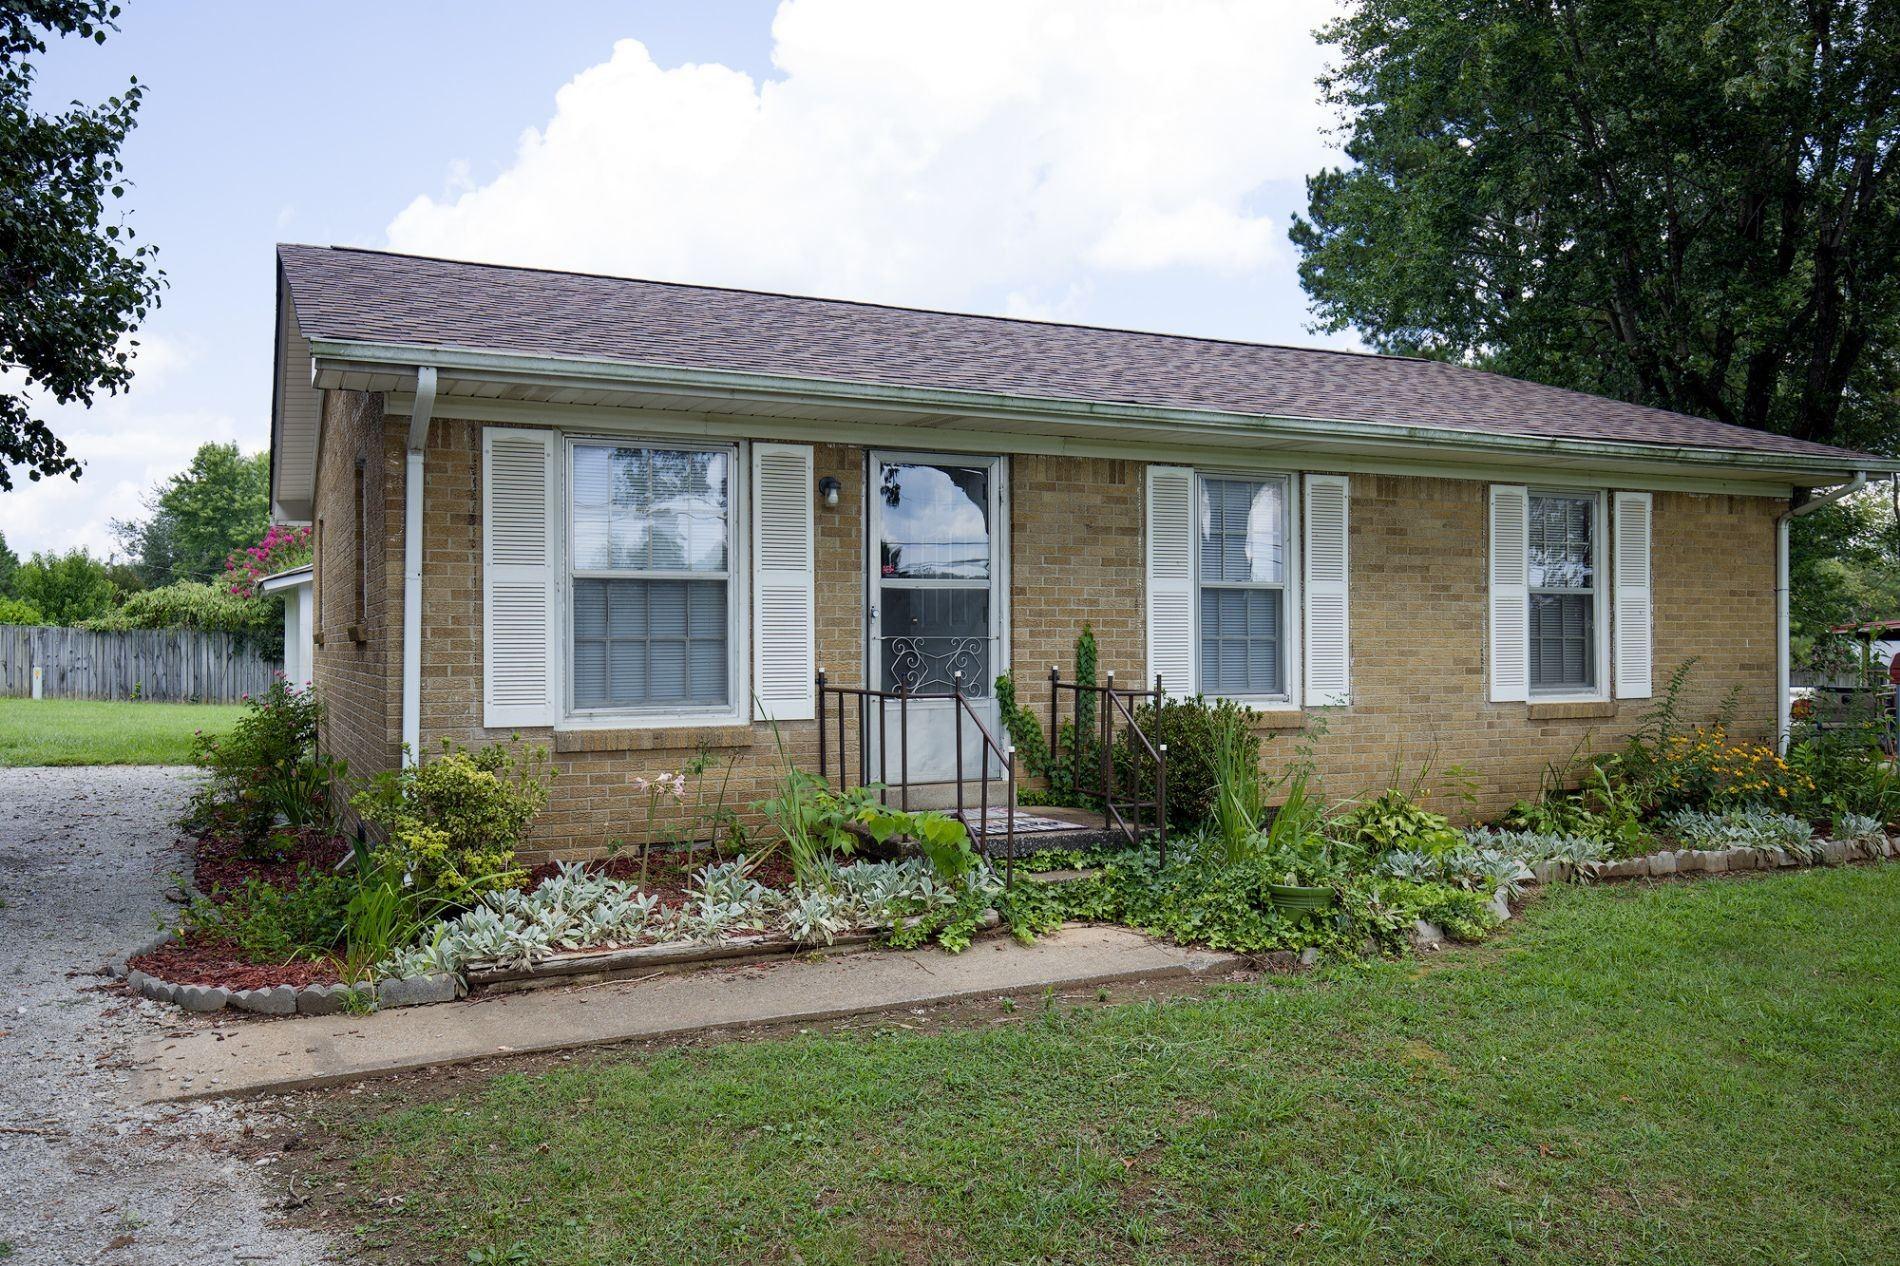 507 Victor St, Lawrenceburg, TN 38464 - MLS#: 2219853